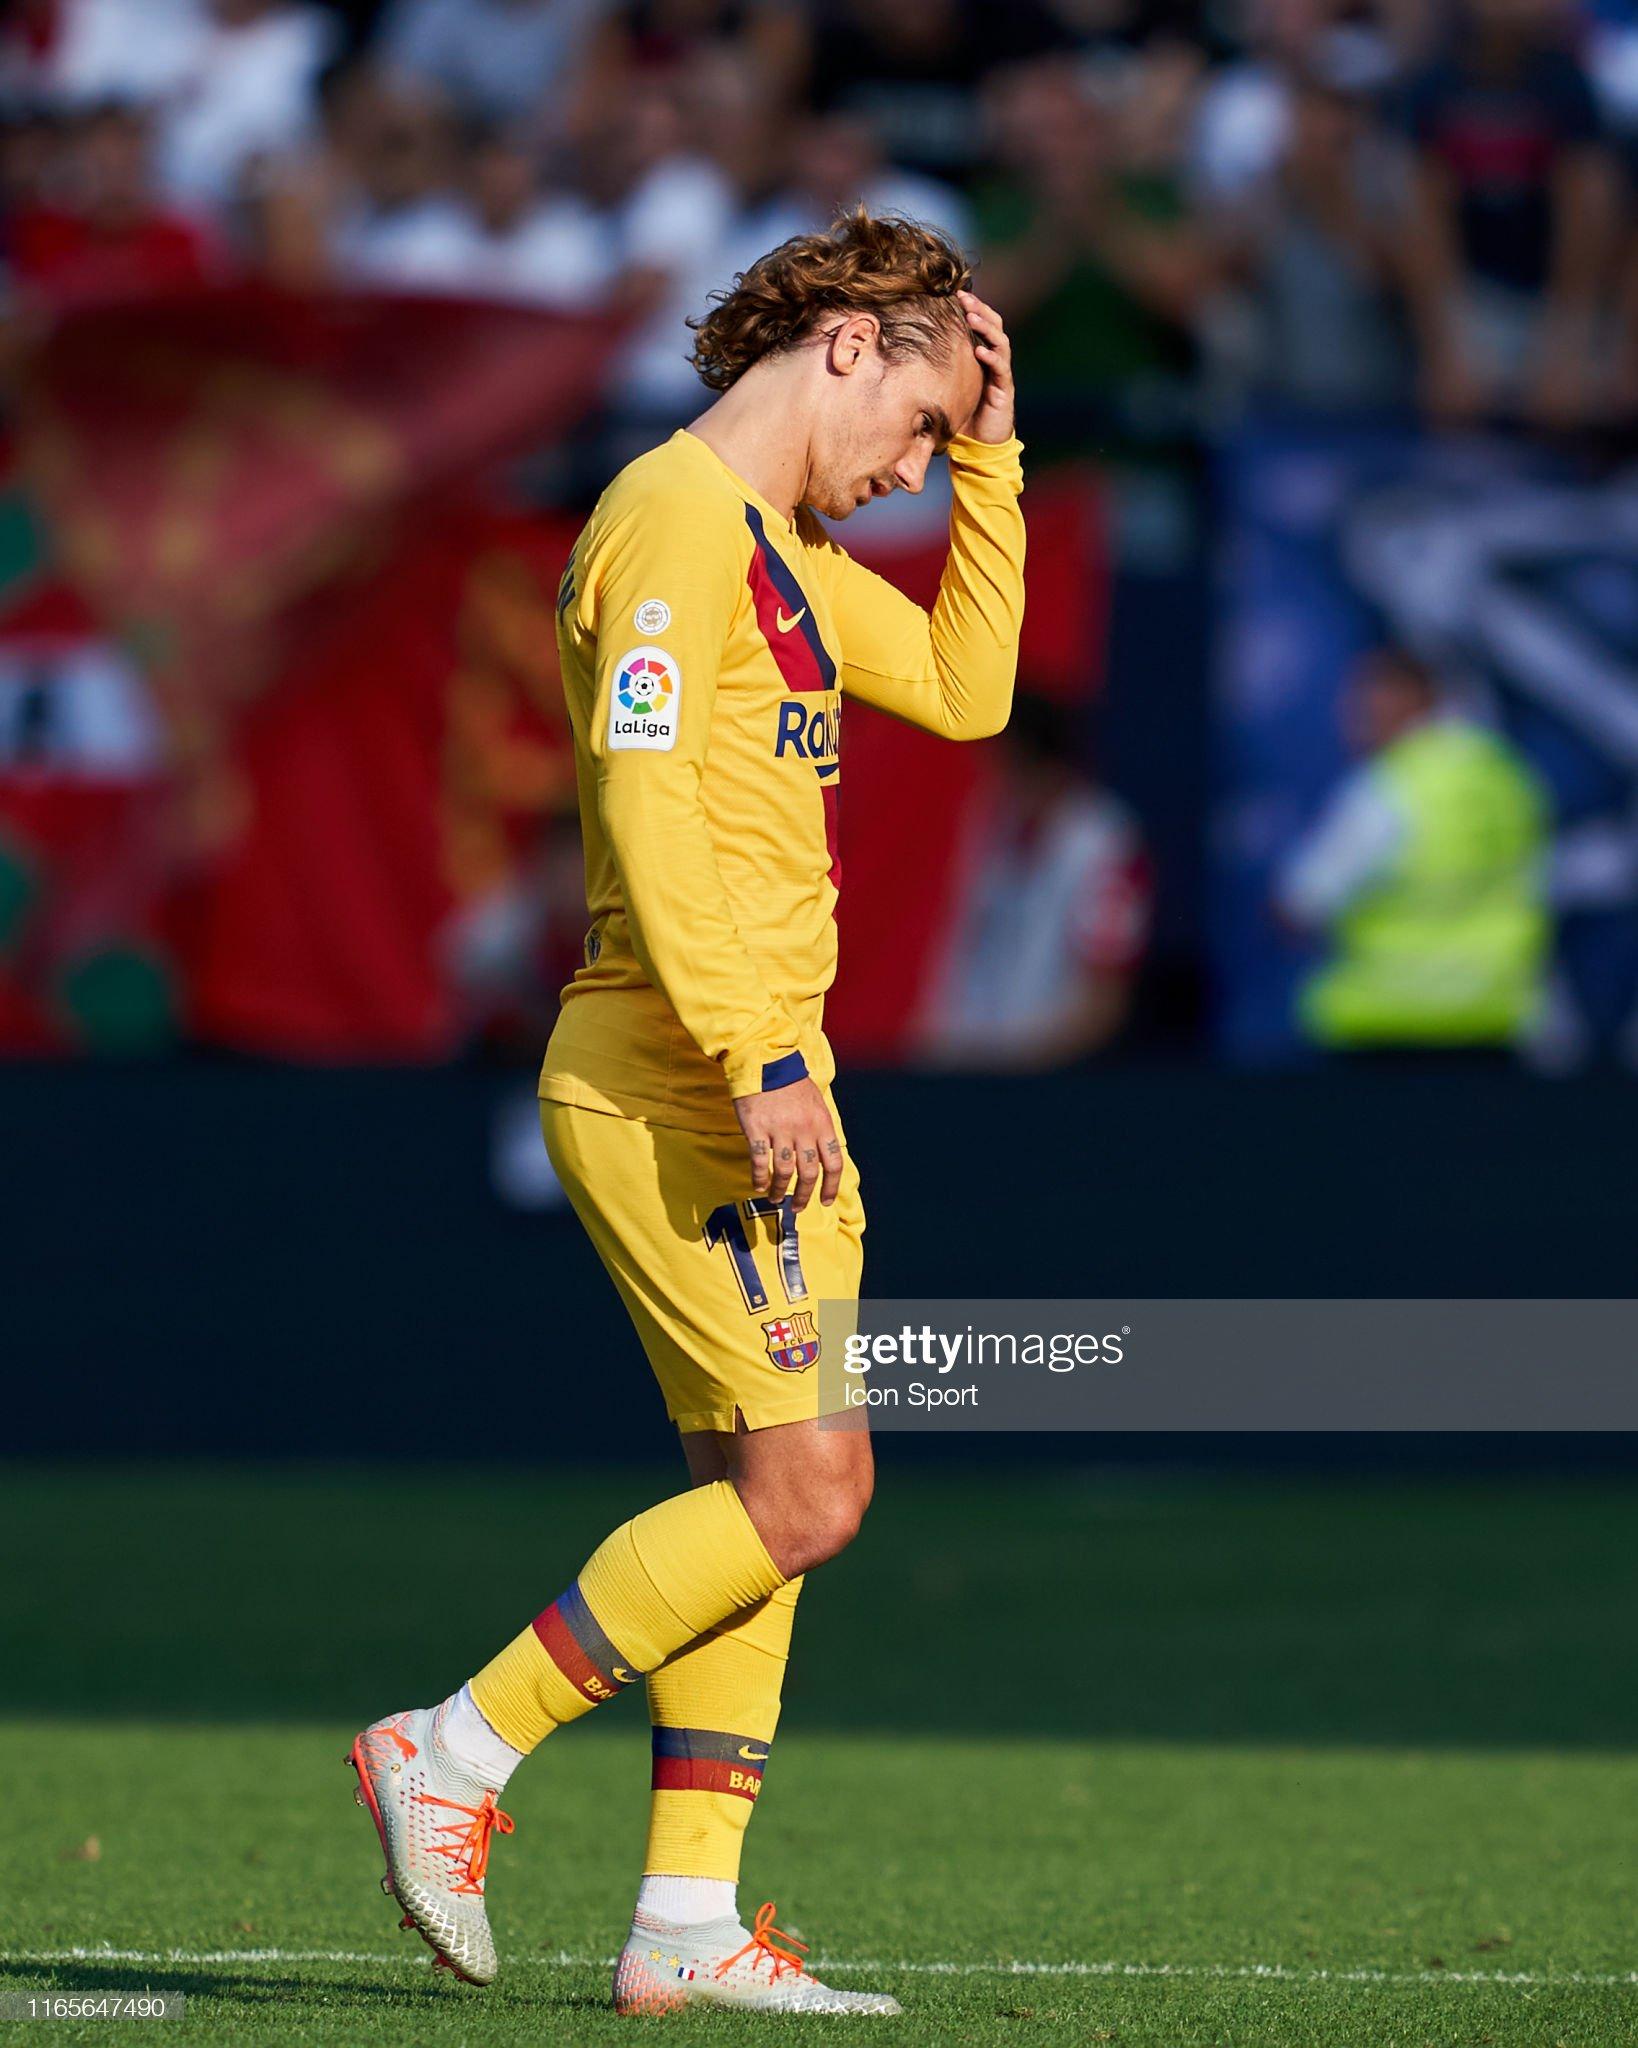 صور مباراة : أوساسونا - برشلونة 2-2 ( 31-08-2019 )  Antoine-griezmann-of-fc-barcelona-during-the-liga-match-between-and-picture-id1165647490?s=2048x2048